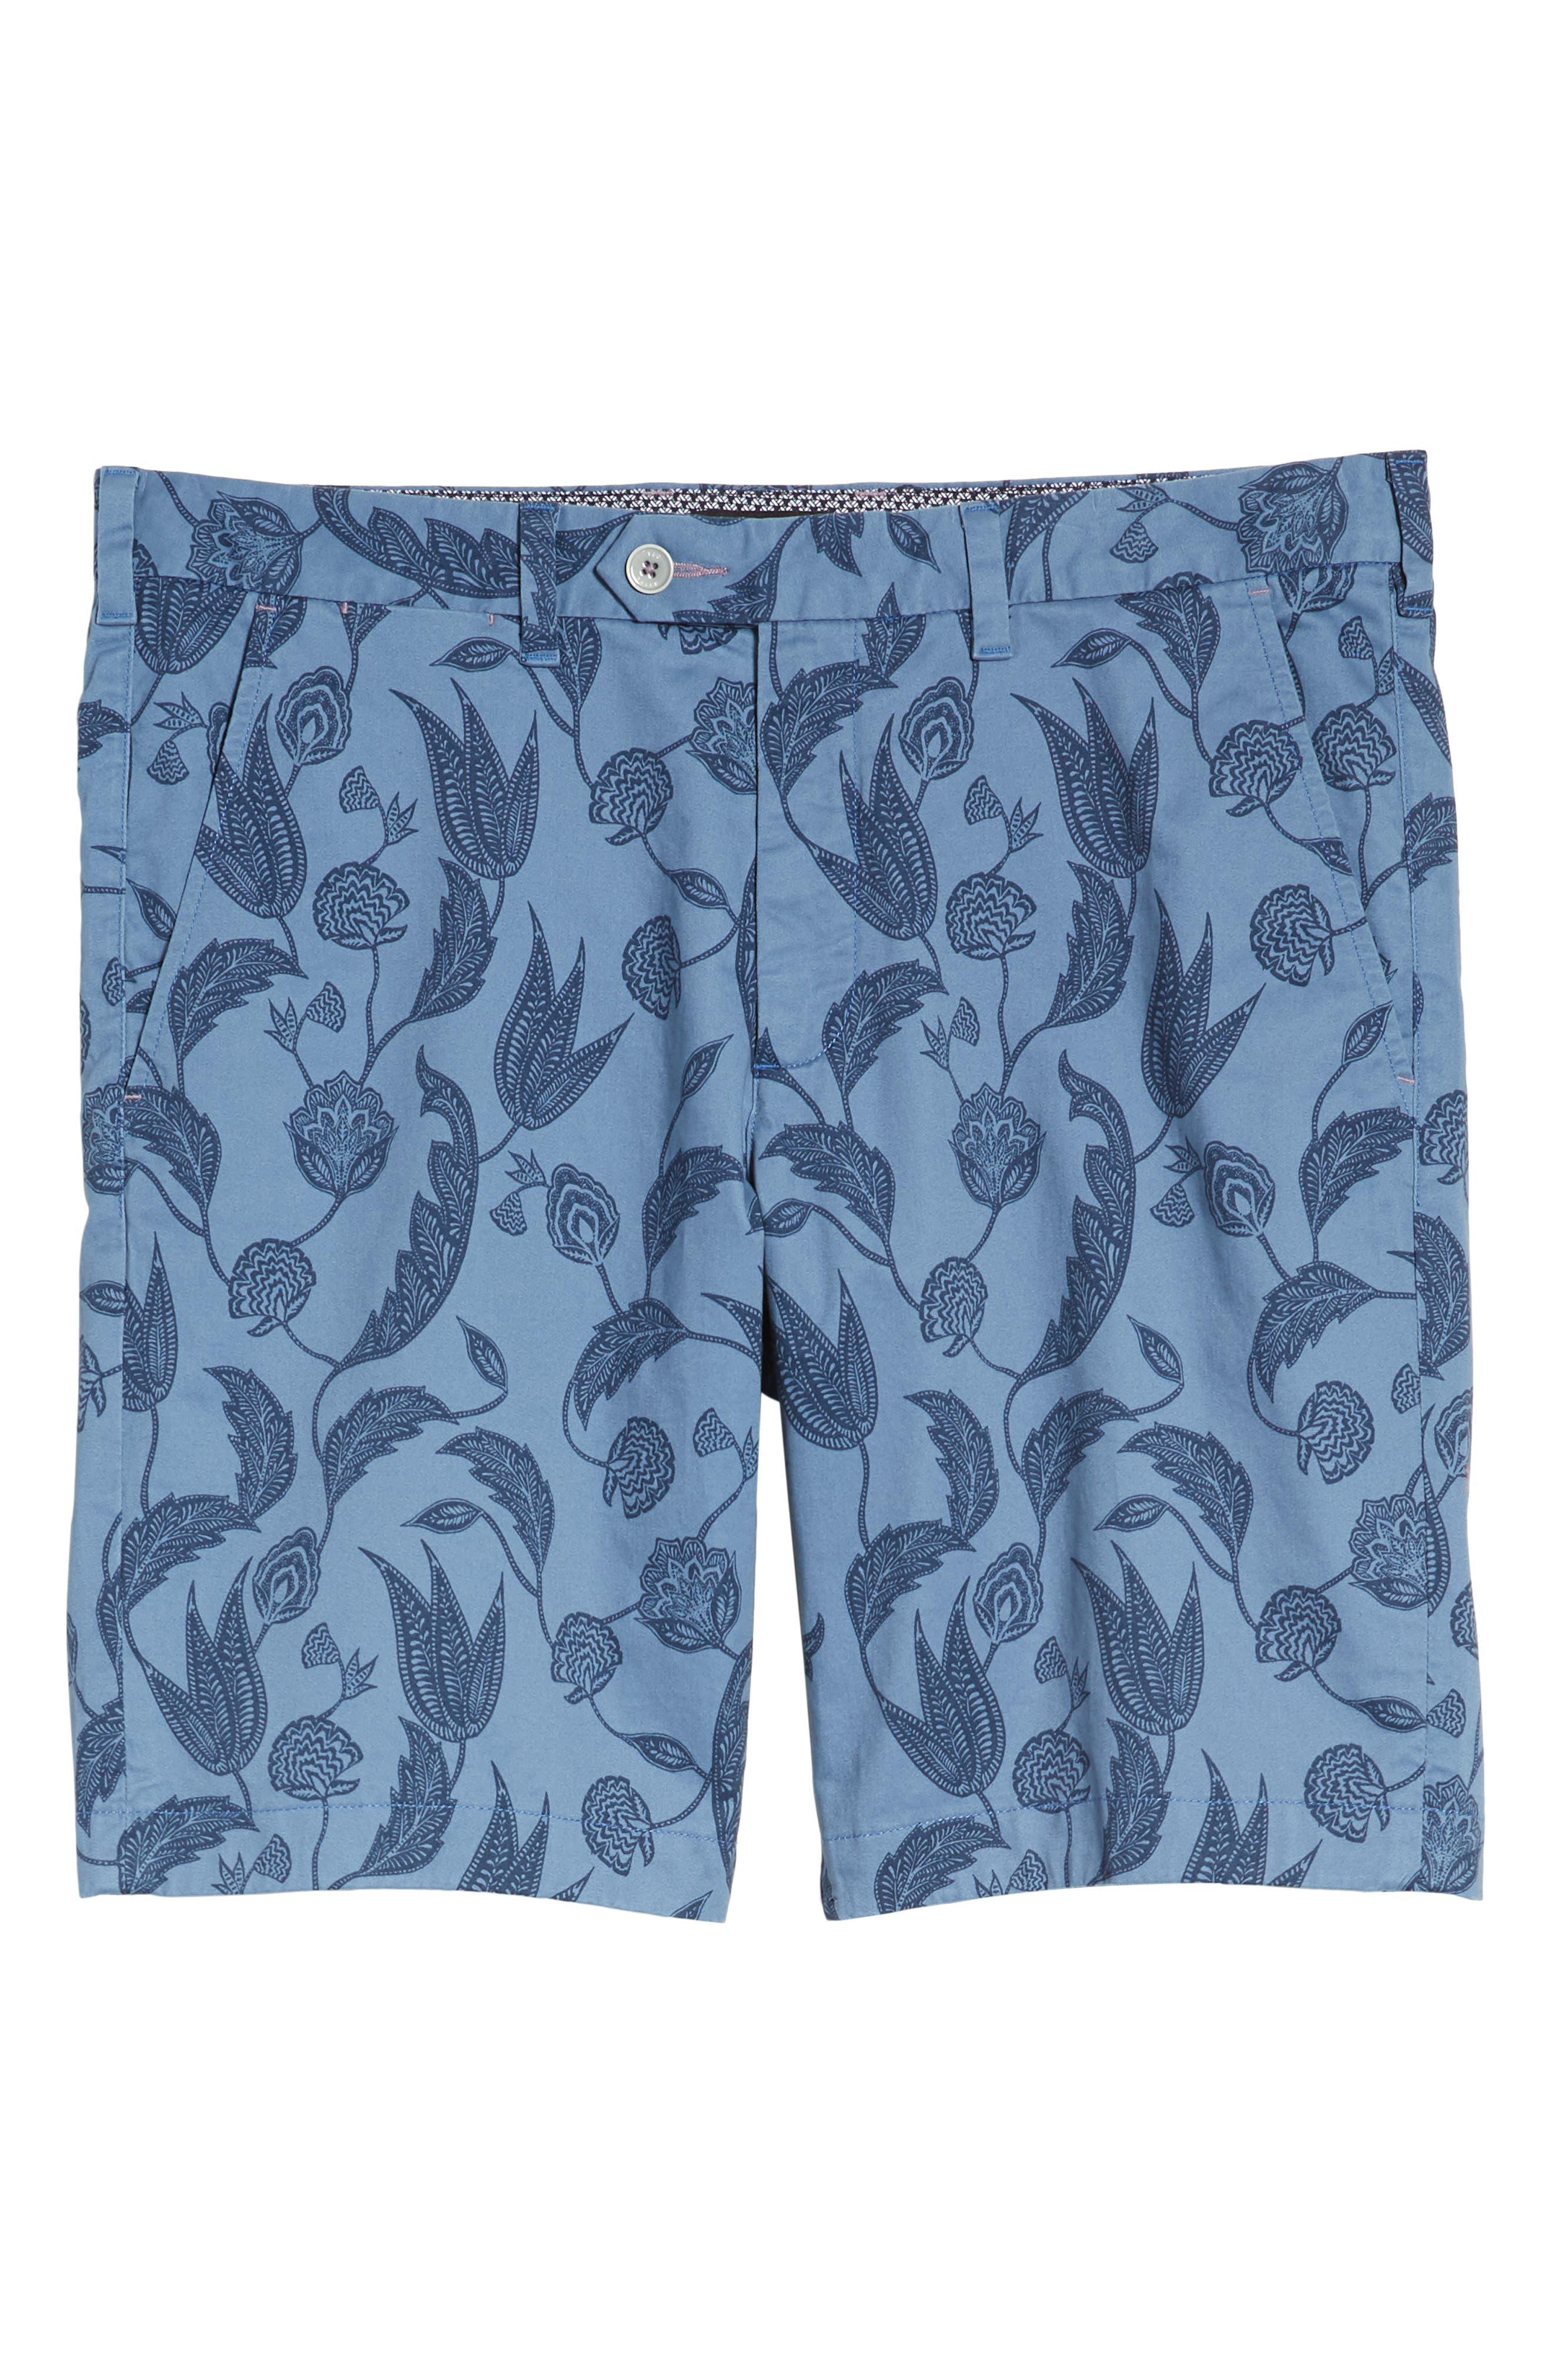 Uniprin Trim Fit Floral Golf Shorts,                             Alternate thumbnail 6, color,                             430